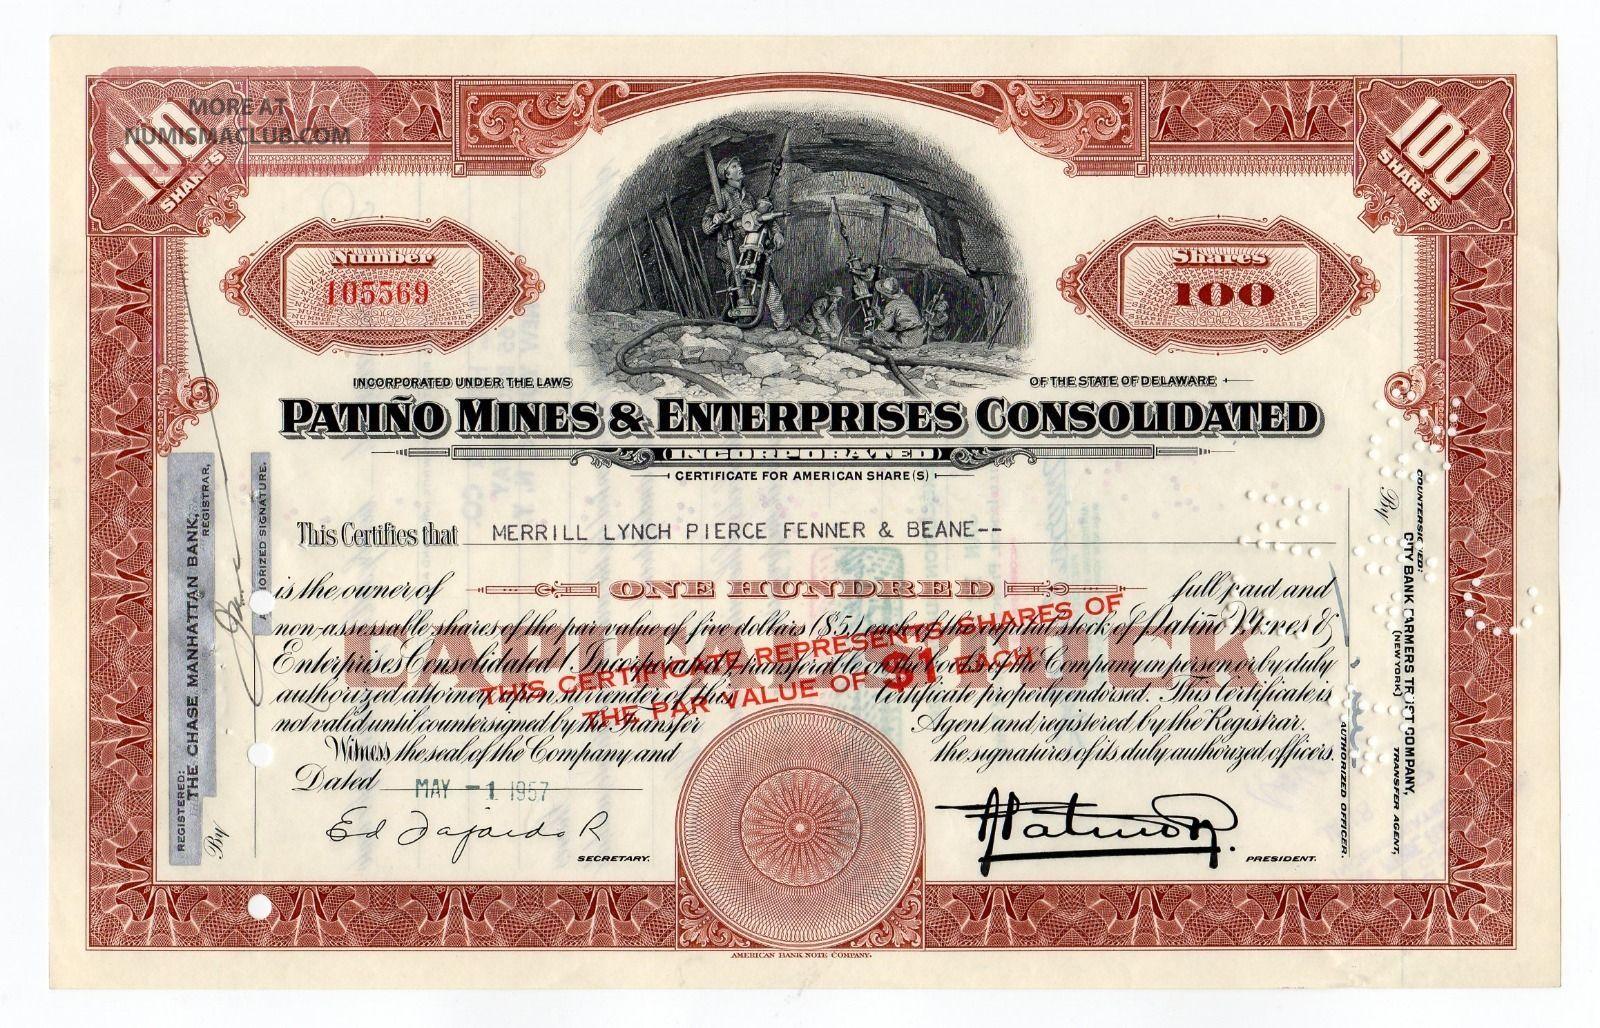 Patino Mines & Enterprises Consolidated Stock Certificate Stocks & Bonds, Scripophily photo